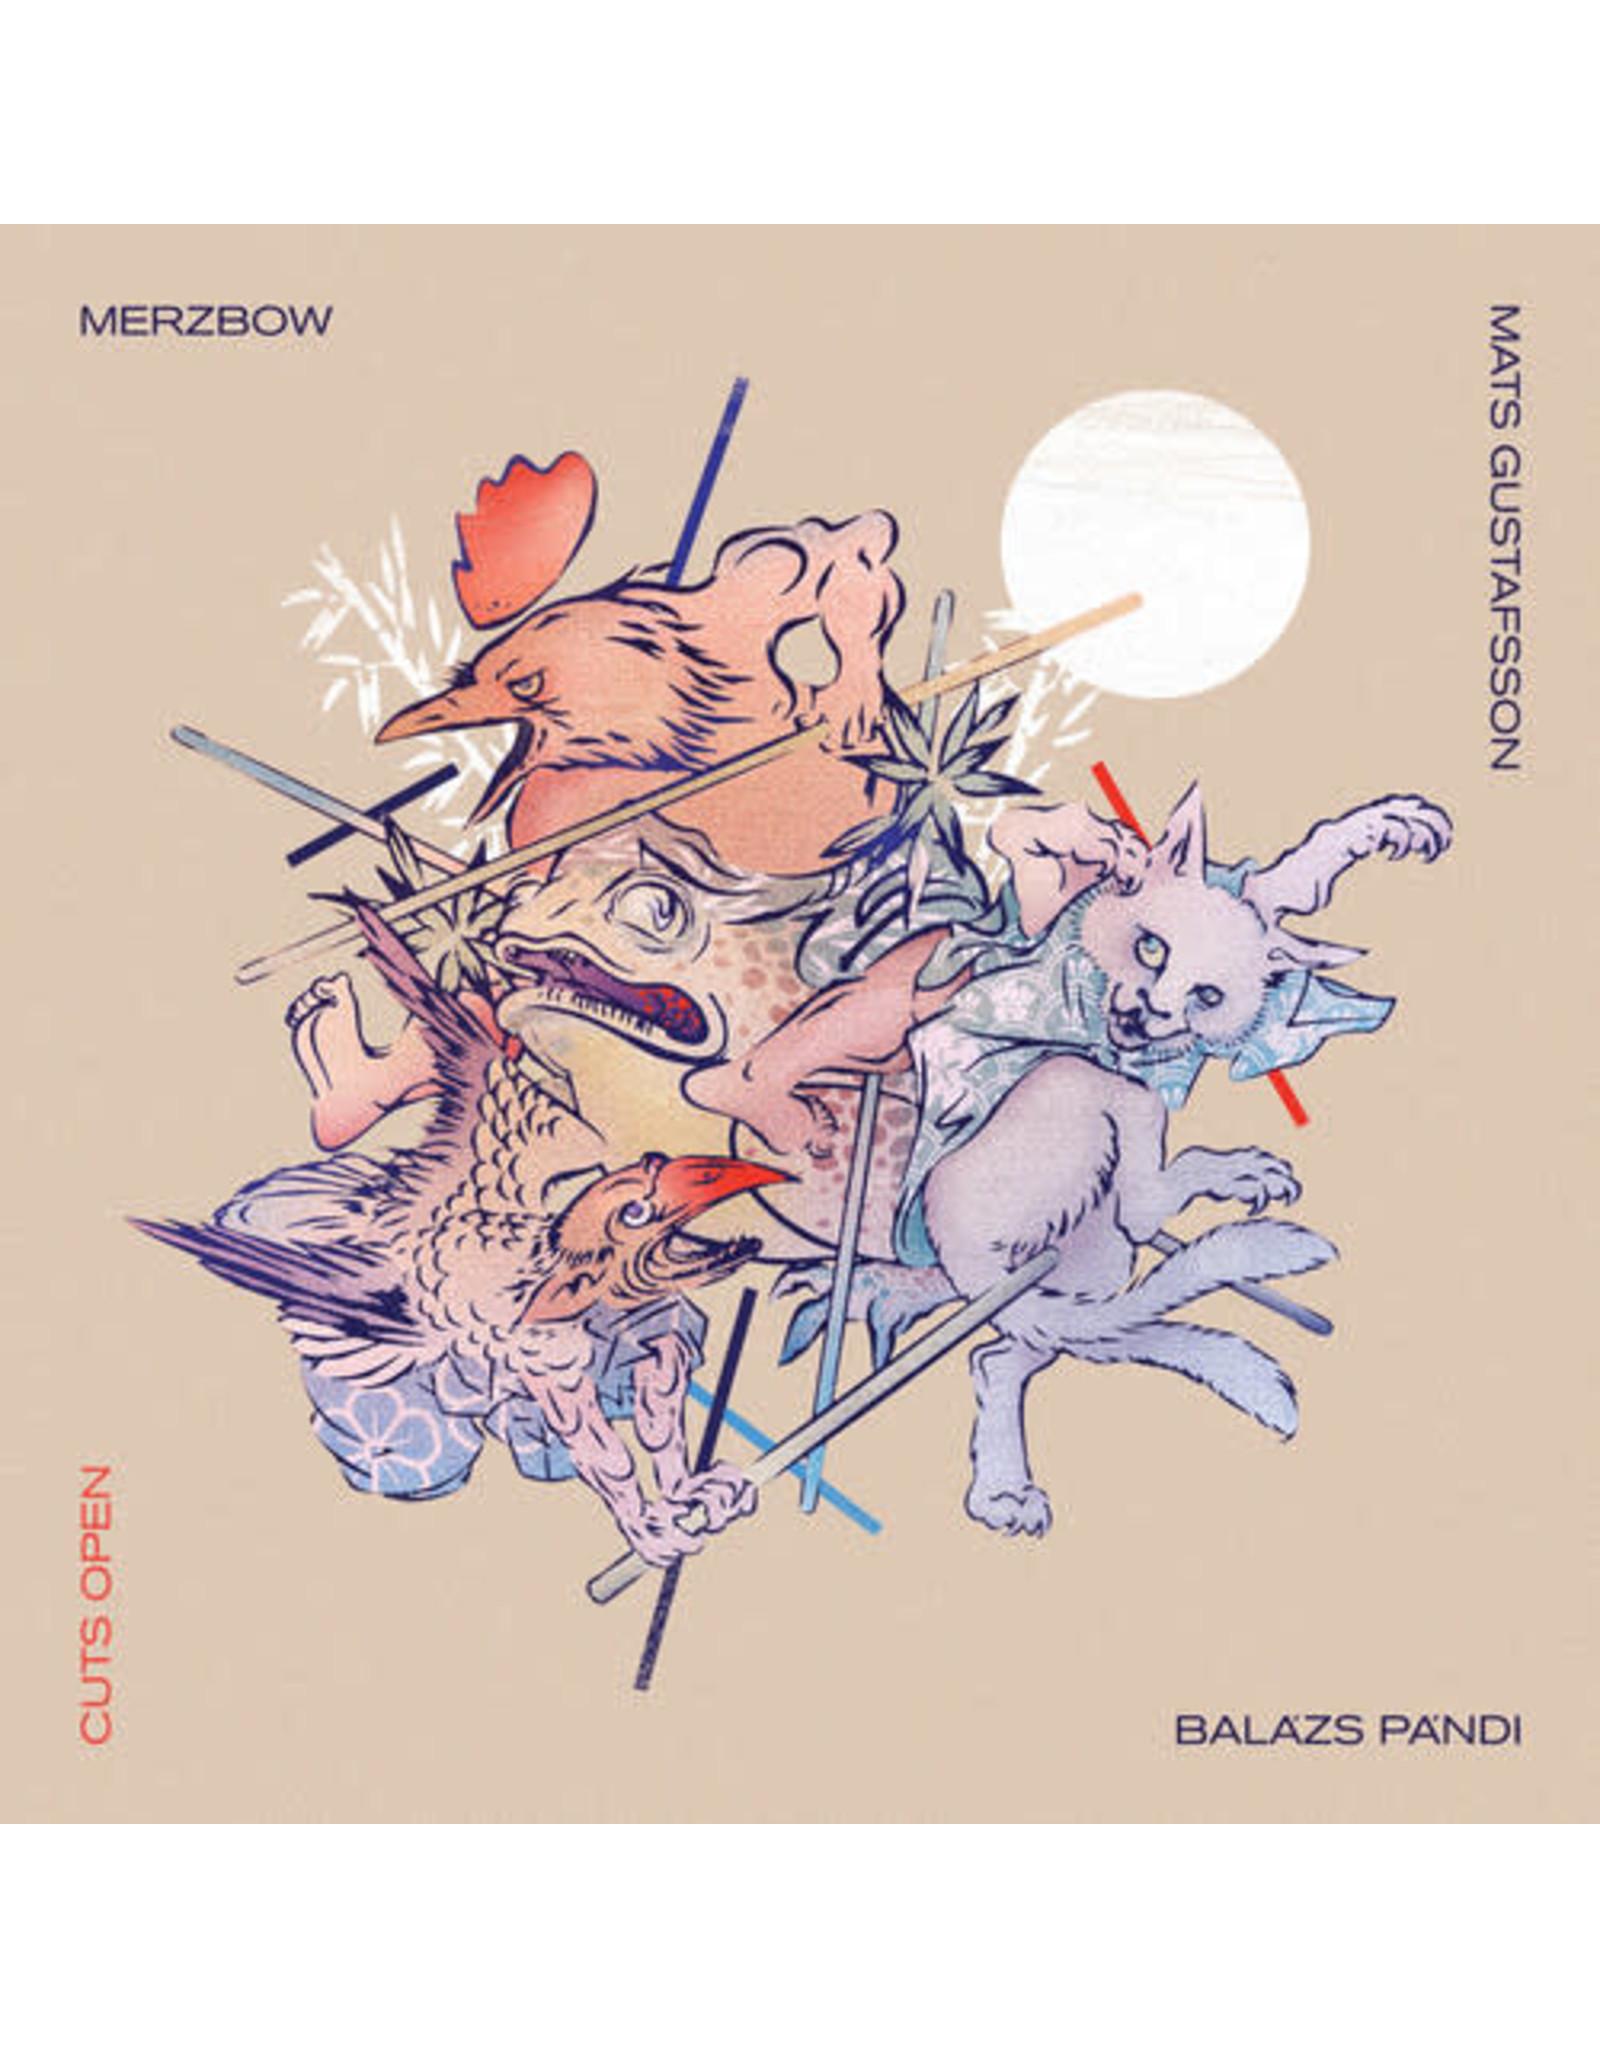 New Vinyl Merzbow / Gustafsson / Pandi - Cuts Open (Colored) 2LP